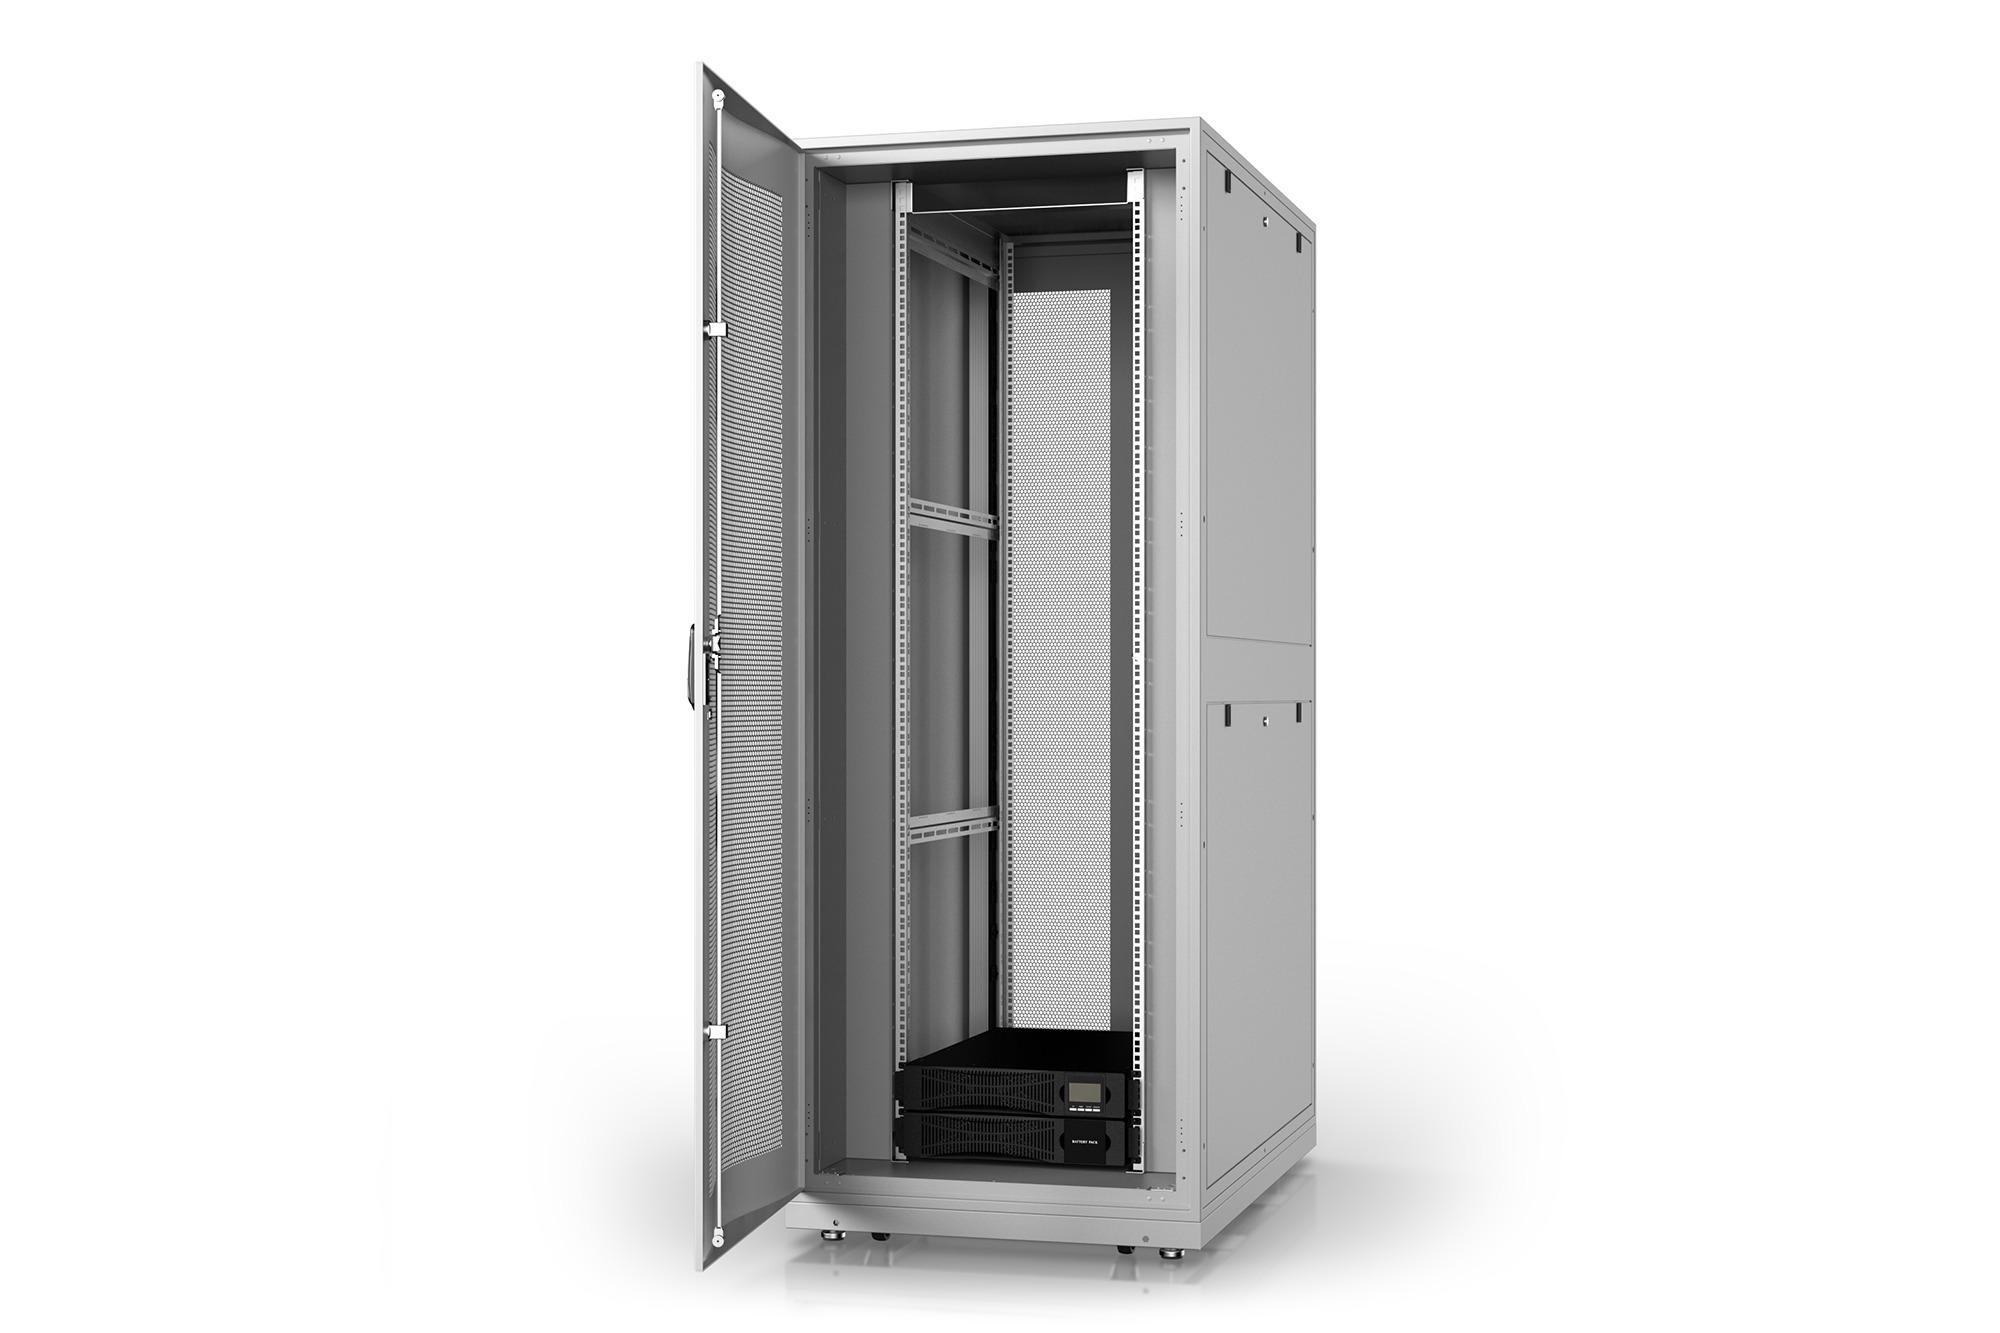 Armadio rack 42u 600×1000 con gruppo di continuita' online 6000va/, multipresa smart